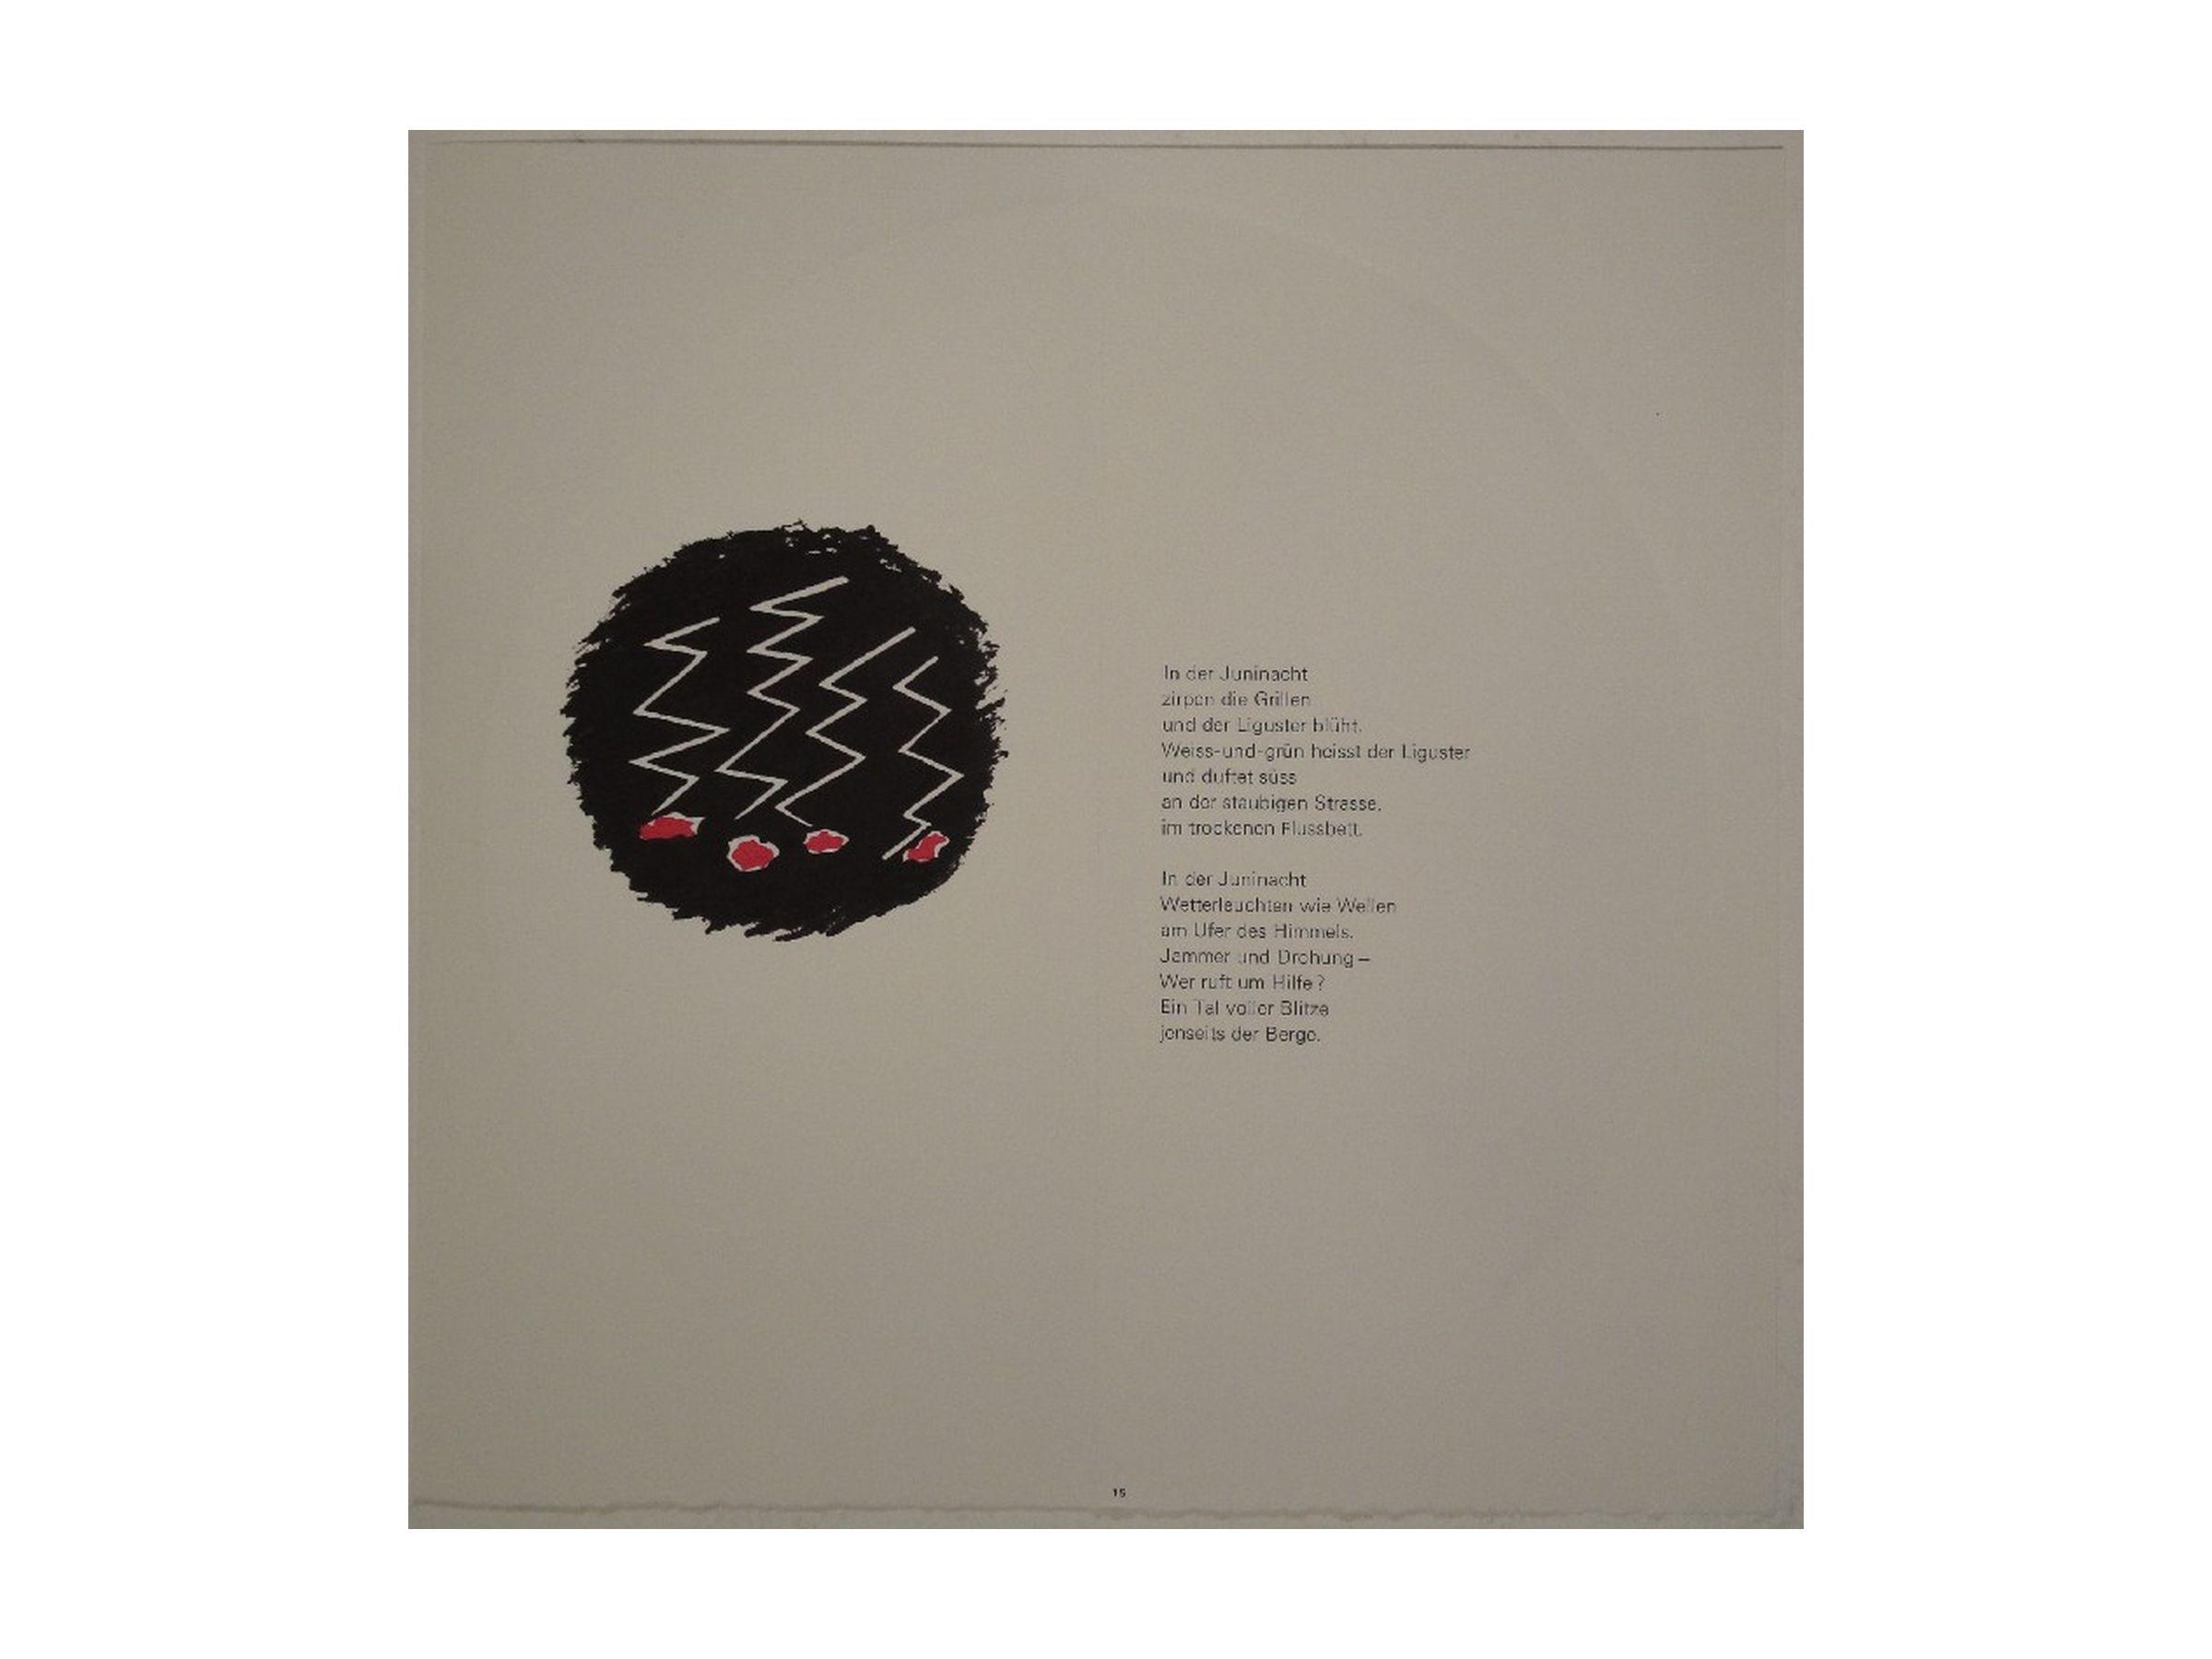 Oppenheim-Sansibar-carrousel-6